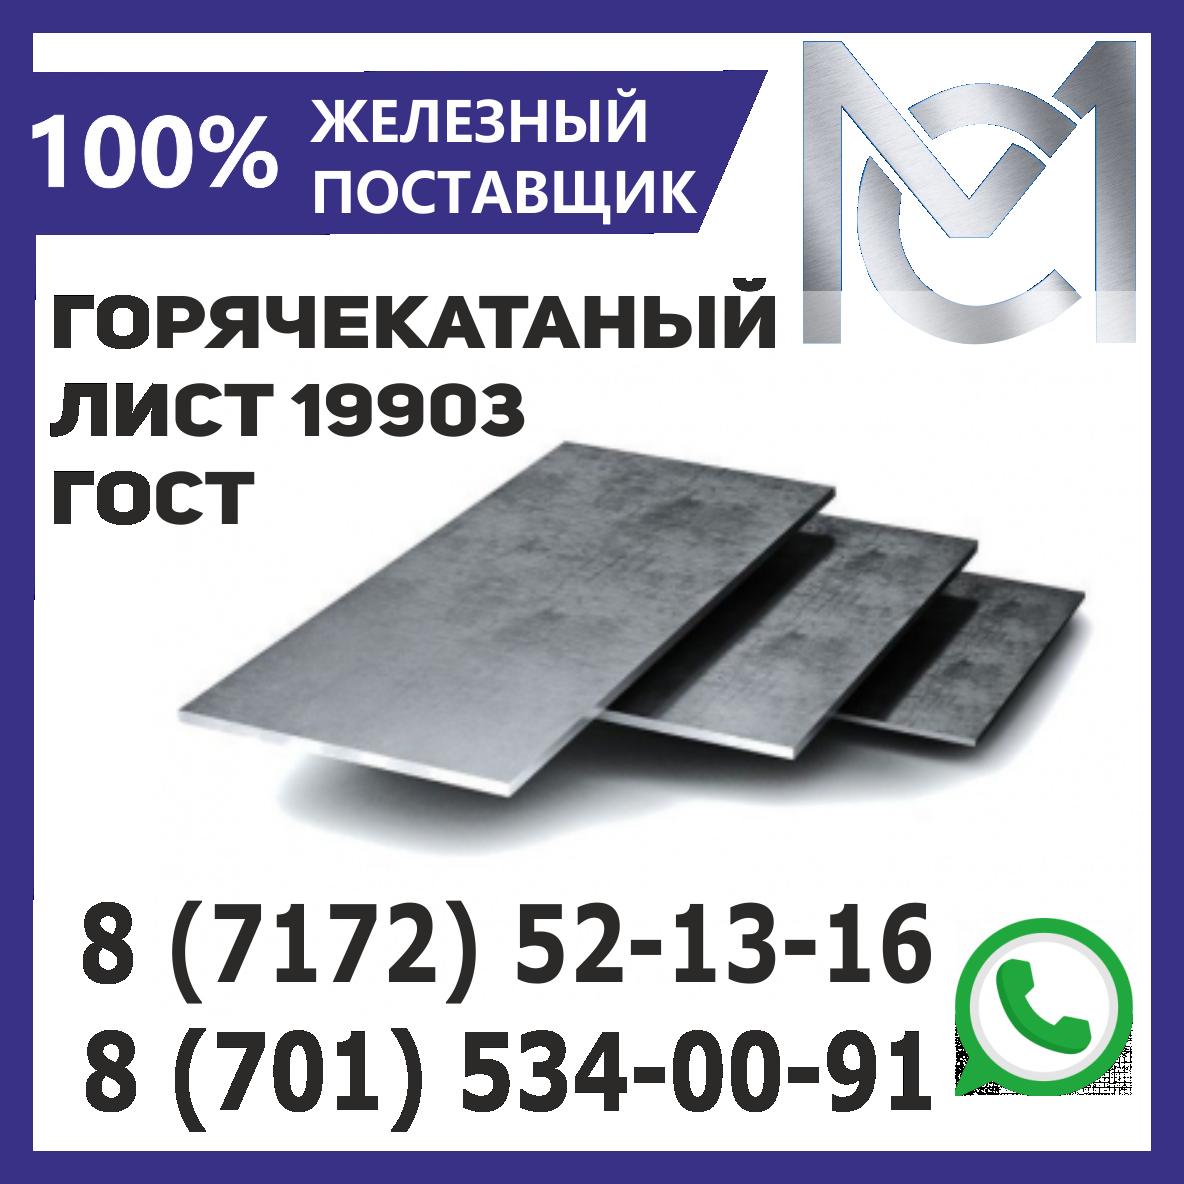 Лист 2,5-3 горячекатаный ГОСТ 19903-74, 1,25х2,5 м.